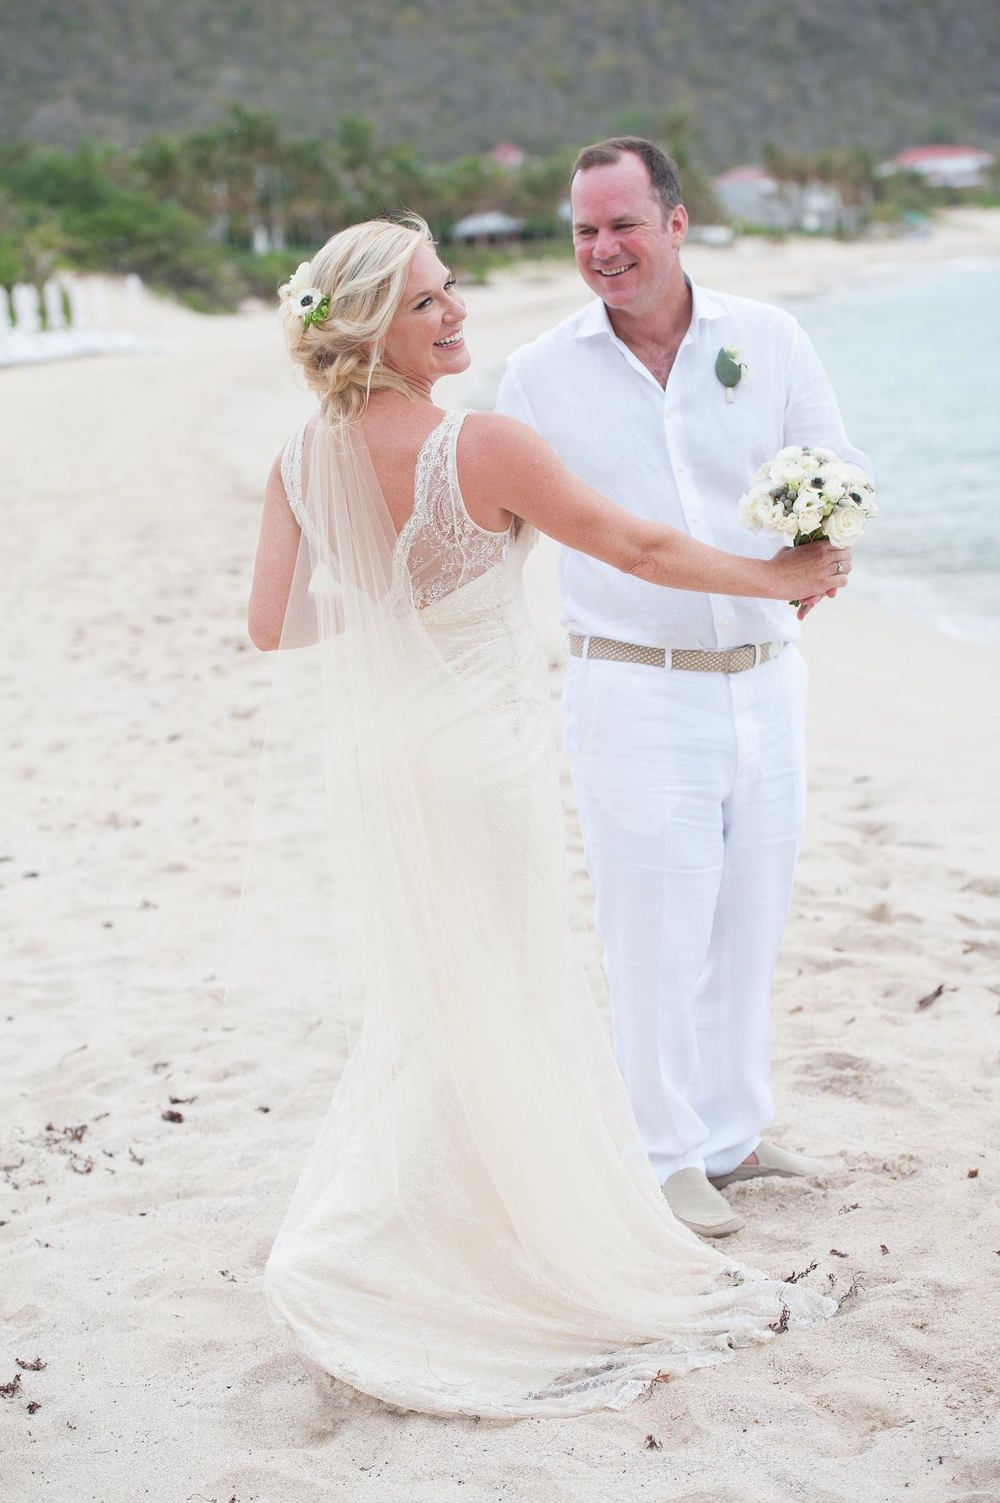 Lovely Wedding Dresses Savannah Ga Check more at http://svesty.com ...